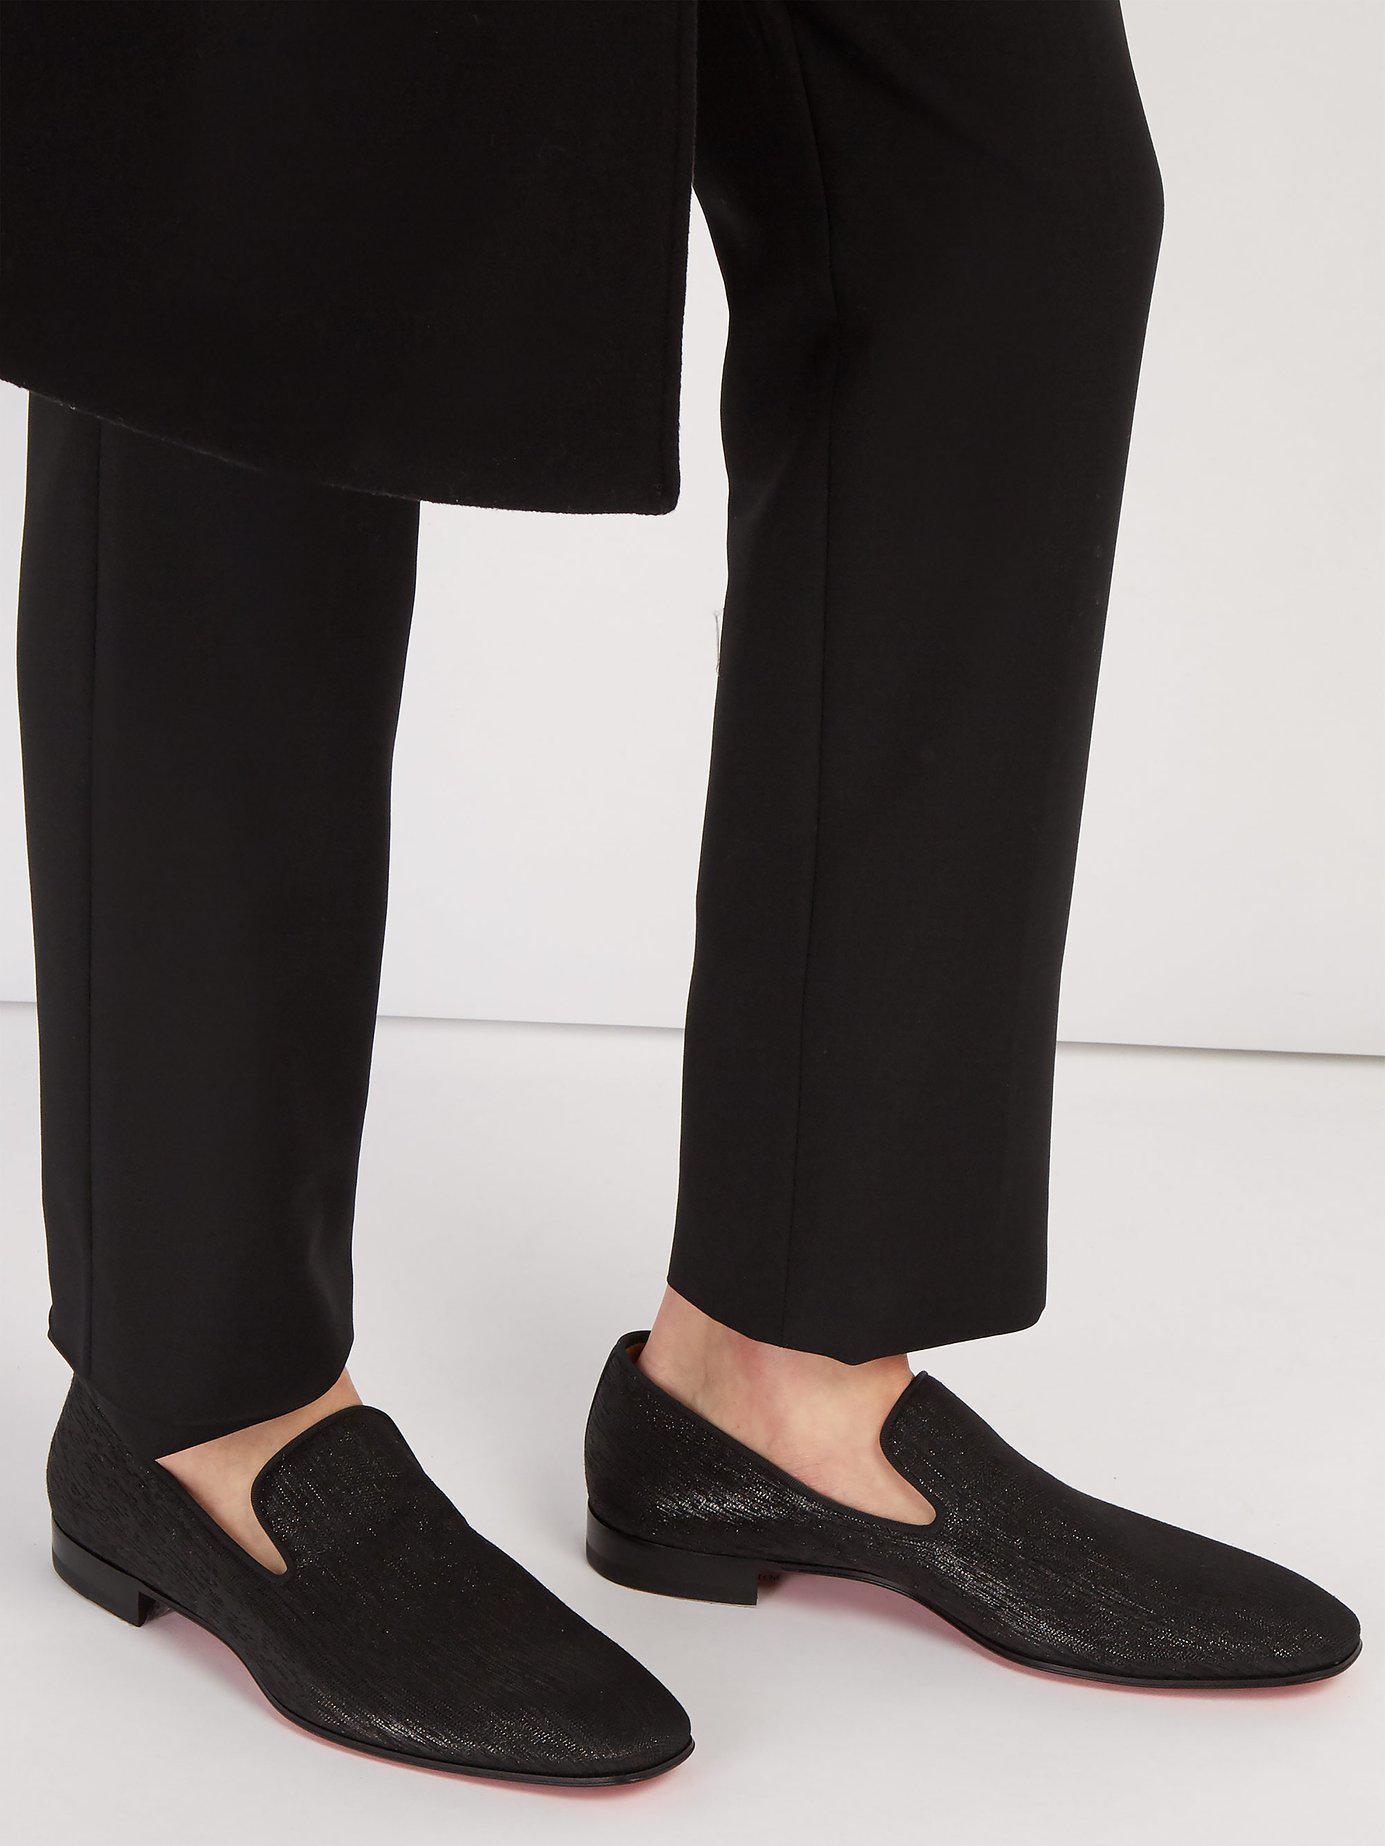 024545b1ea5 Men's Black Dandelion Metallic Shantung Loafers